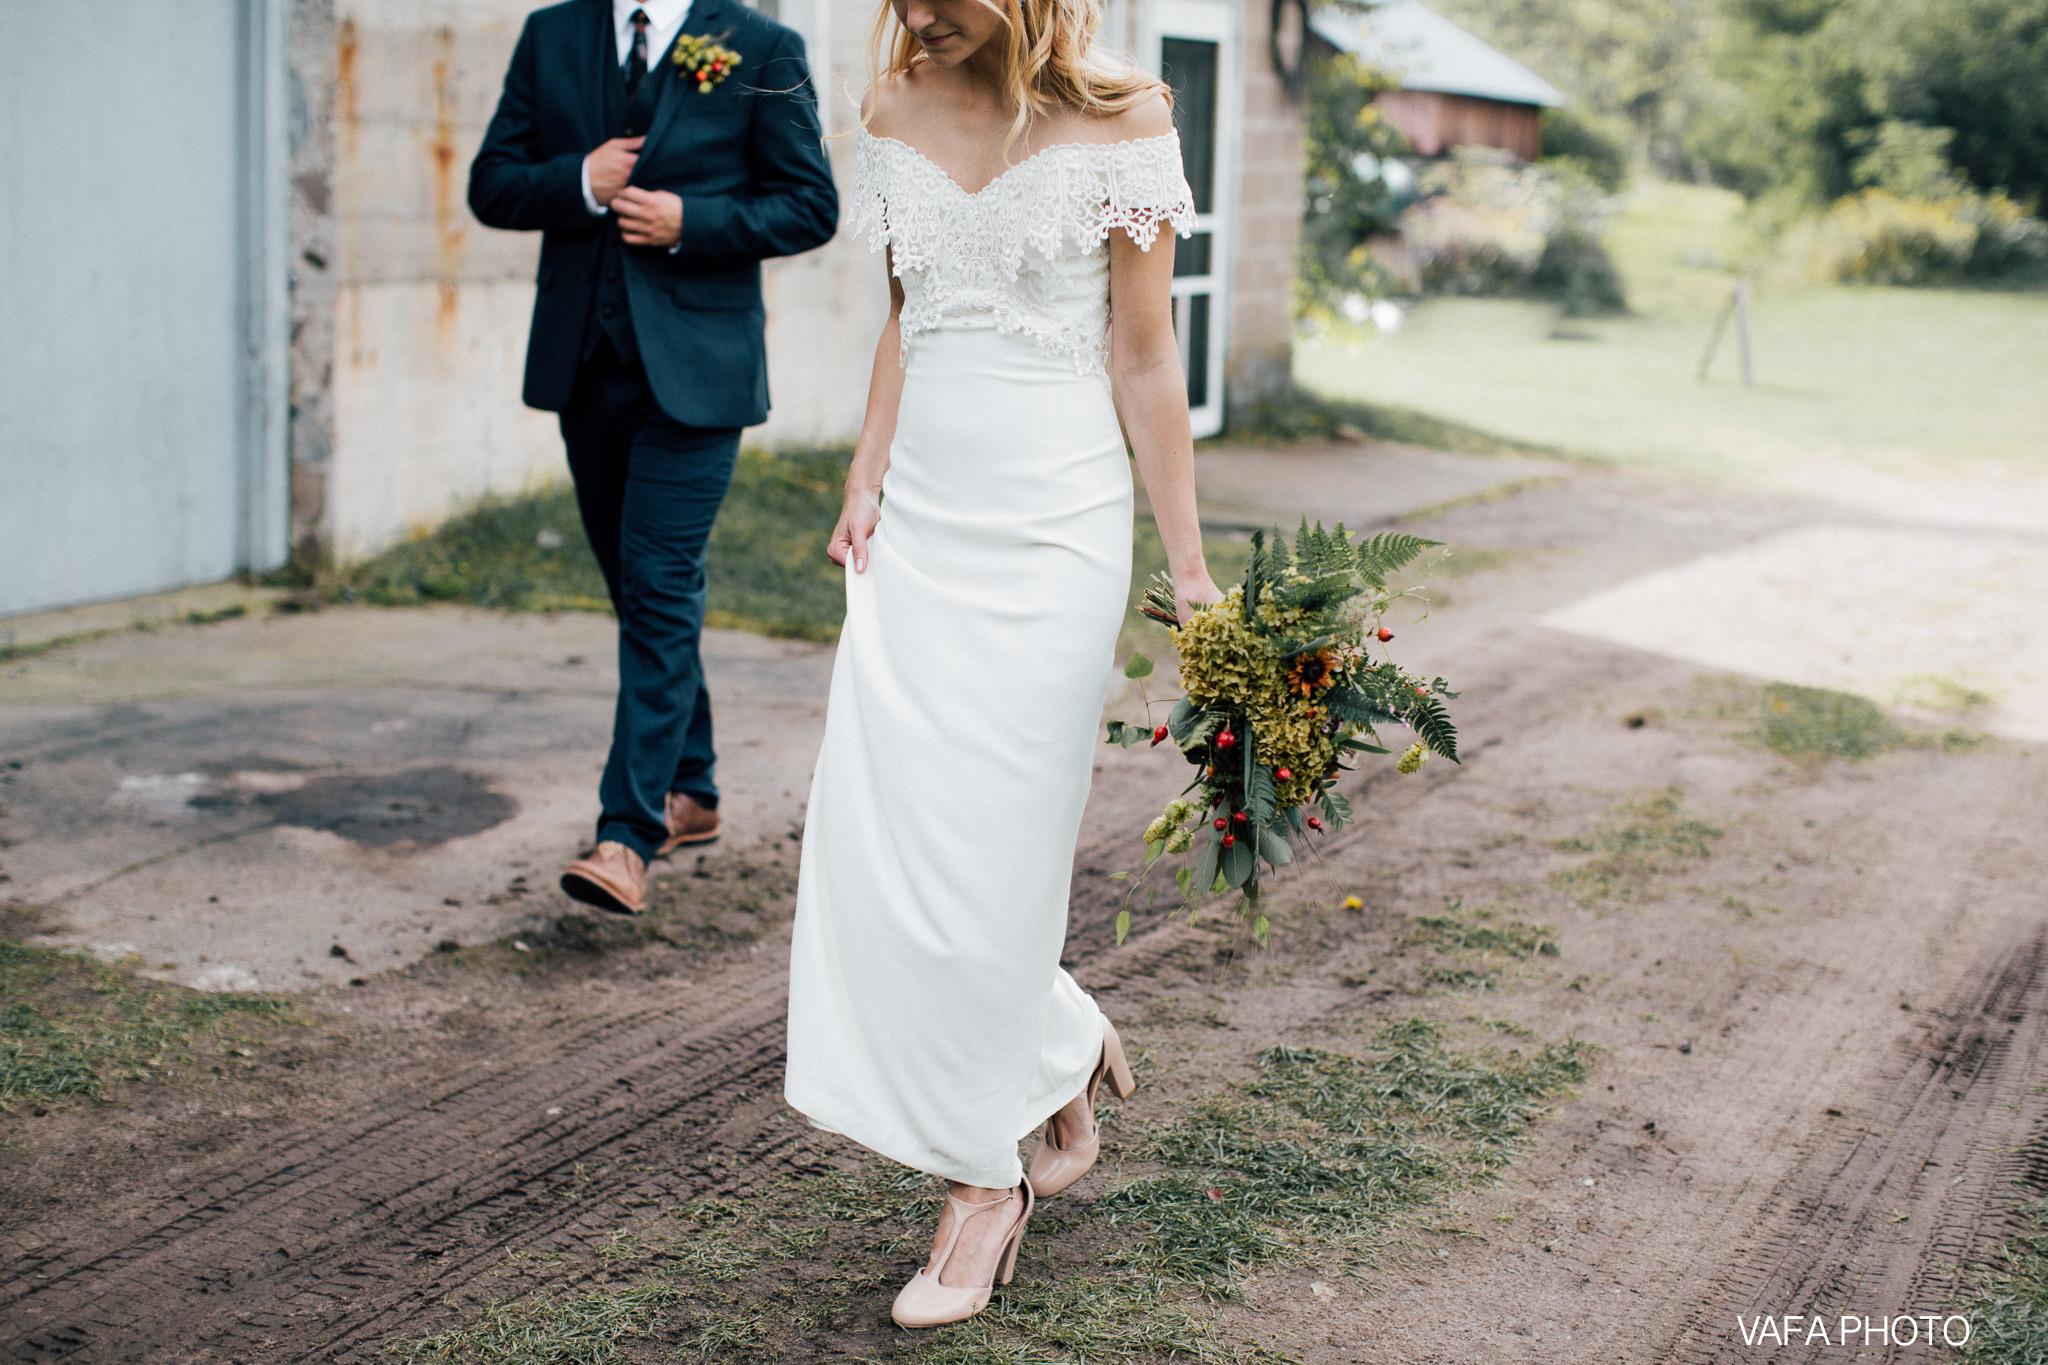 Belsolda-Farm-Wedding-Christy-Eric-Vafa-Photo-214.jpg